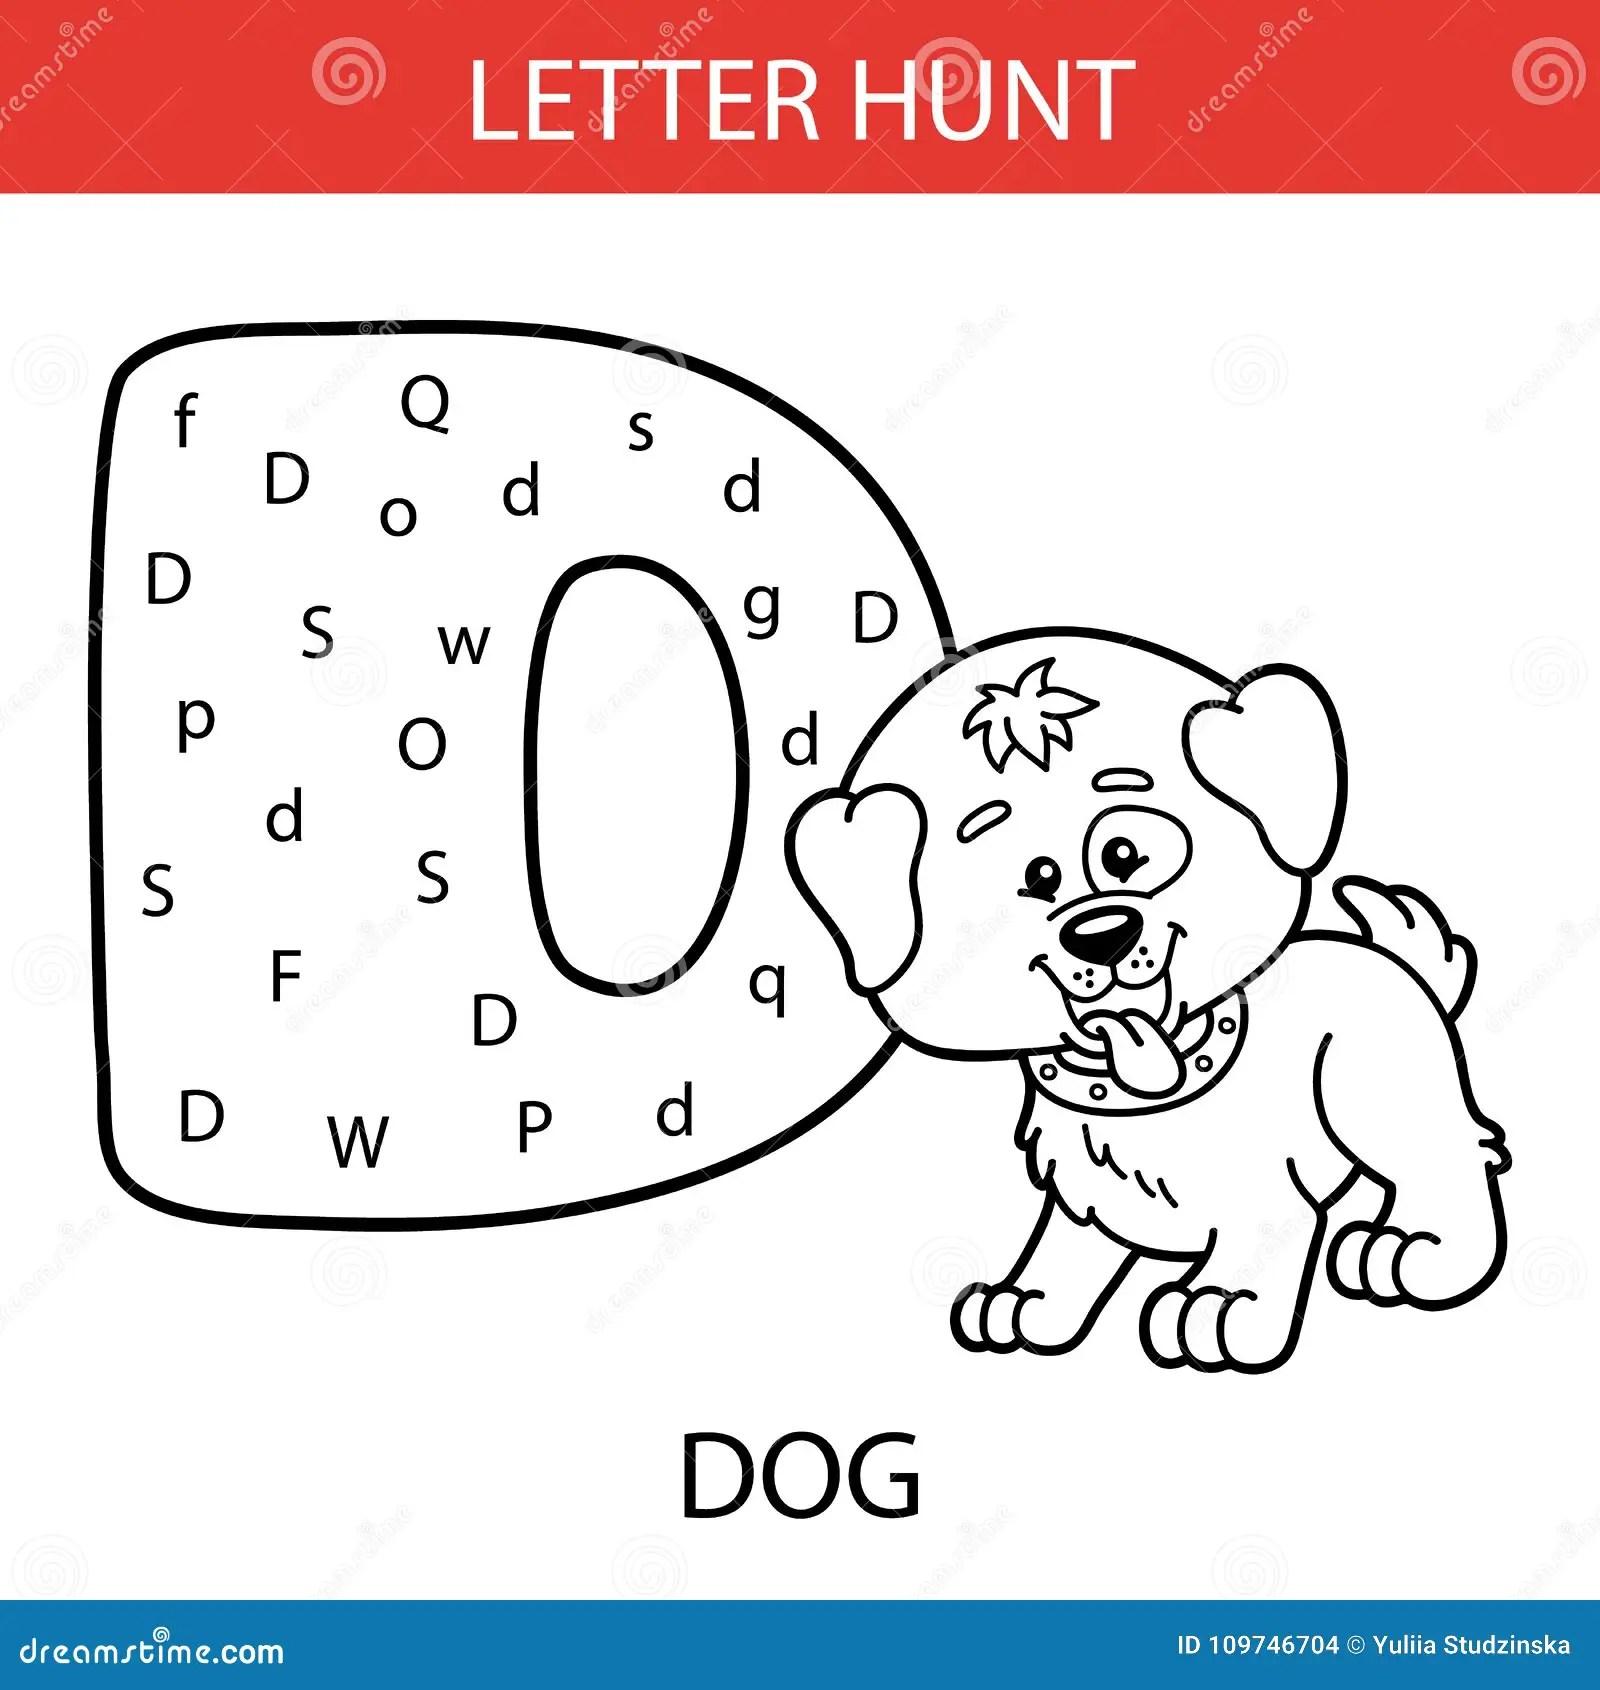 Animal Letter Hunt Dog Stock Vector Illustration Of